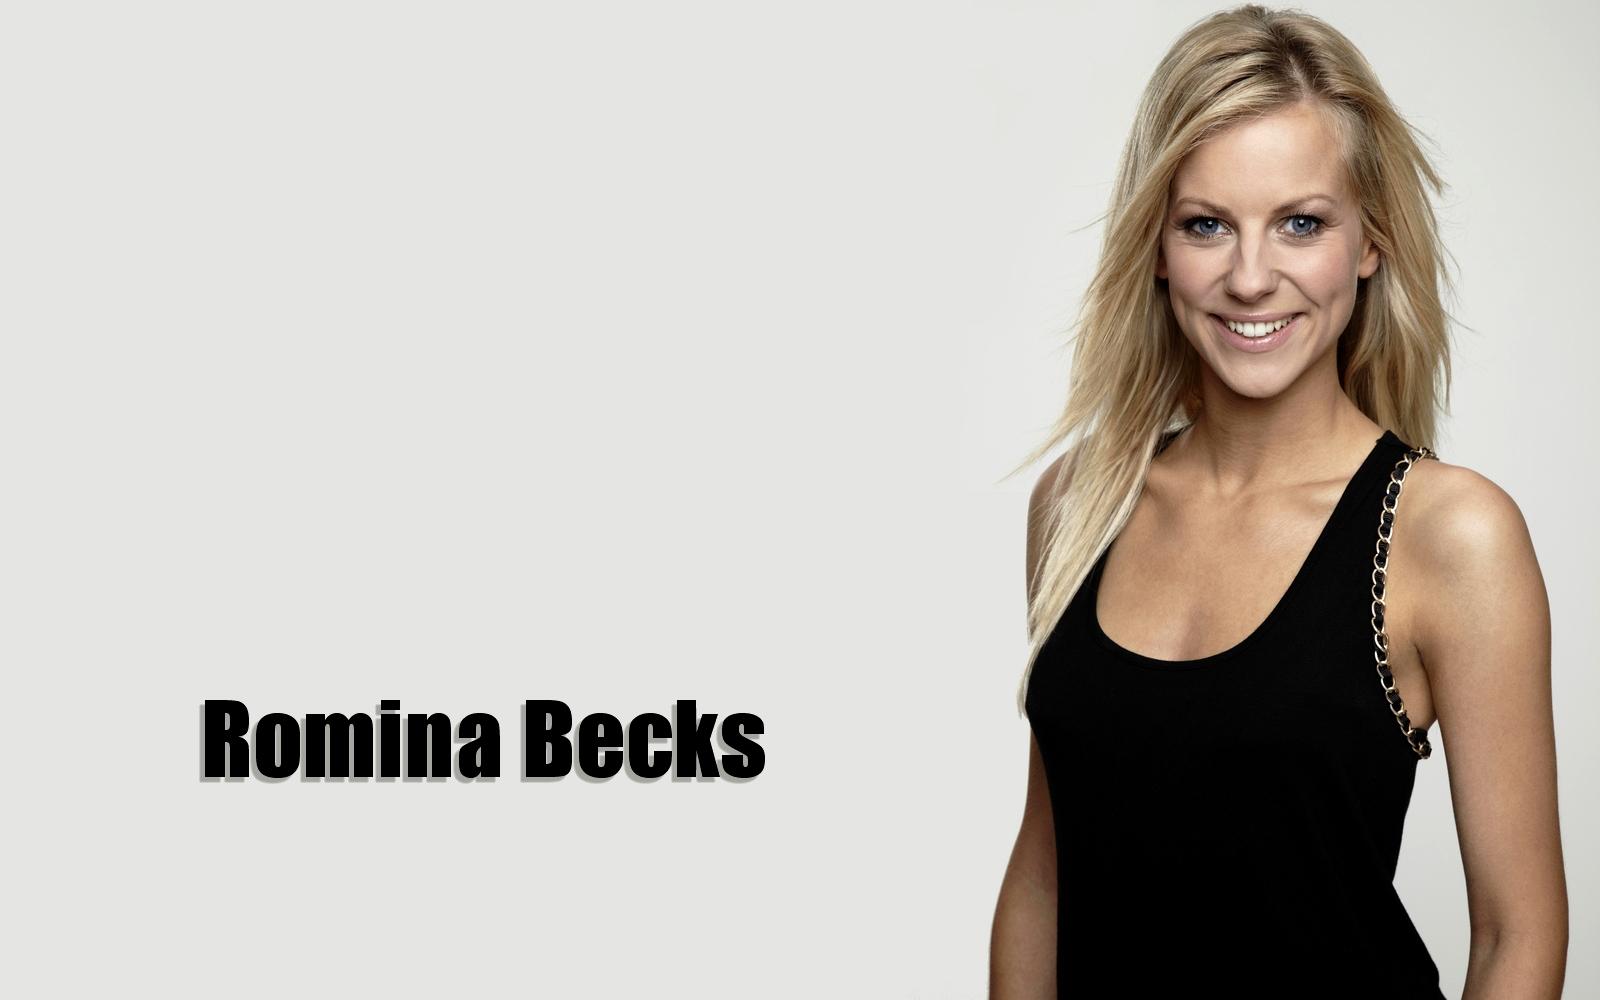 romina becks